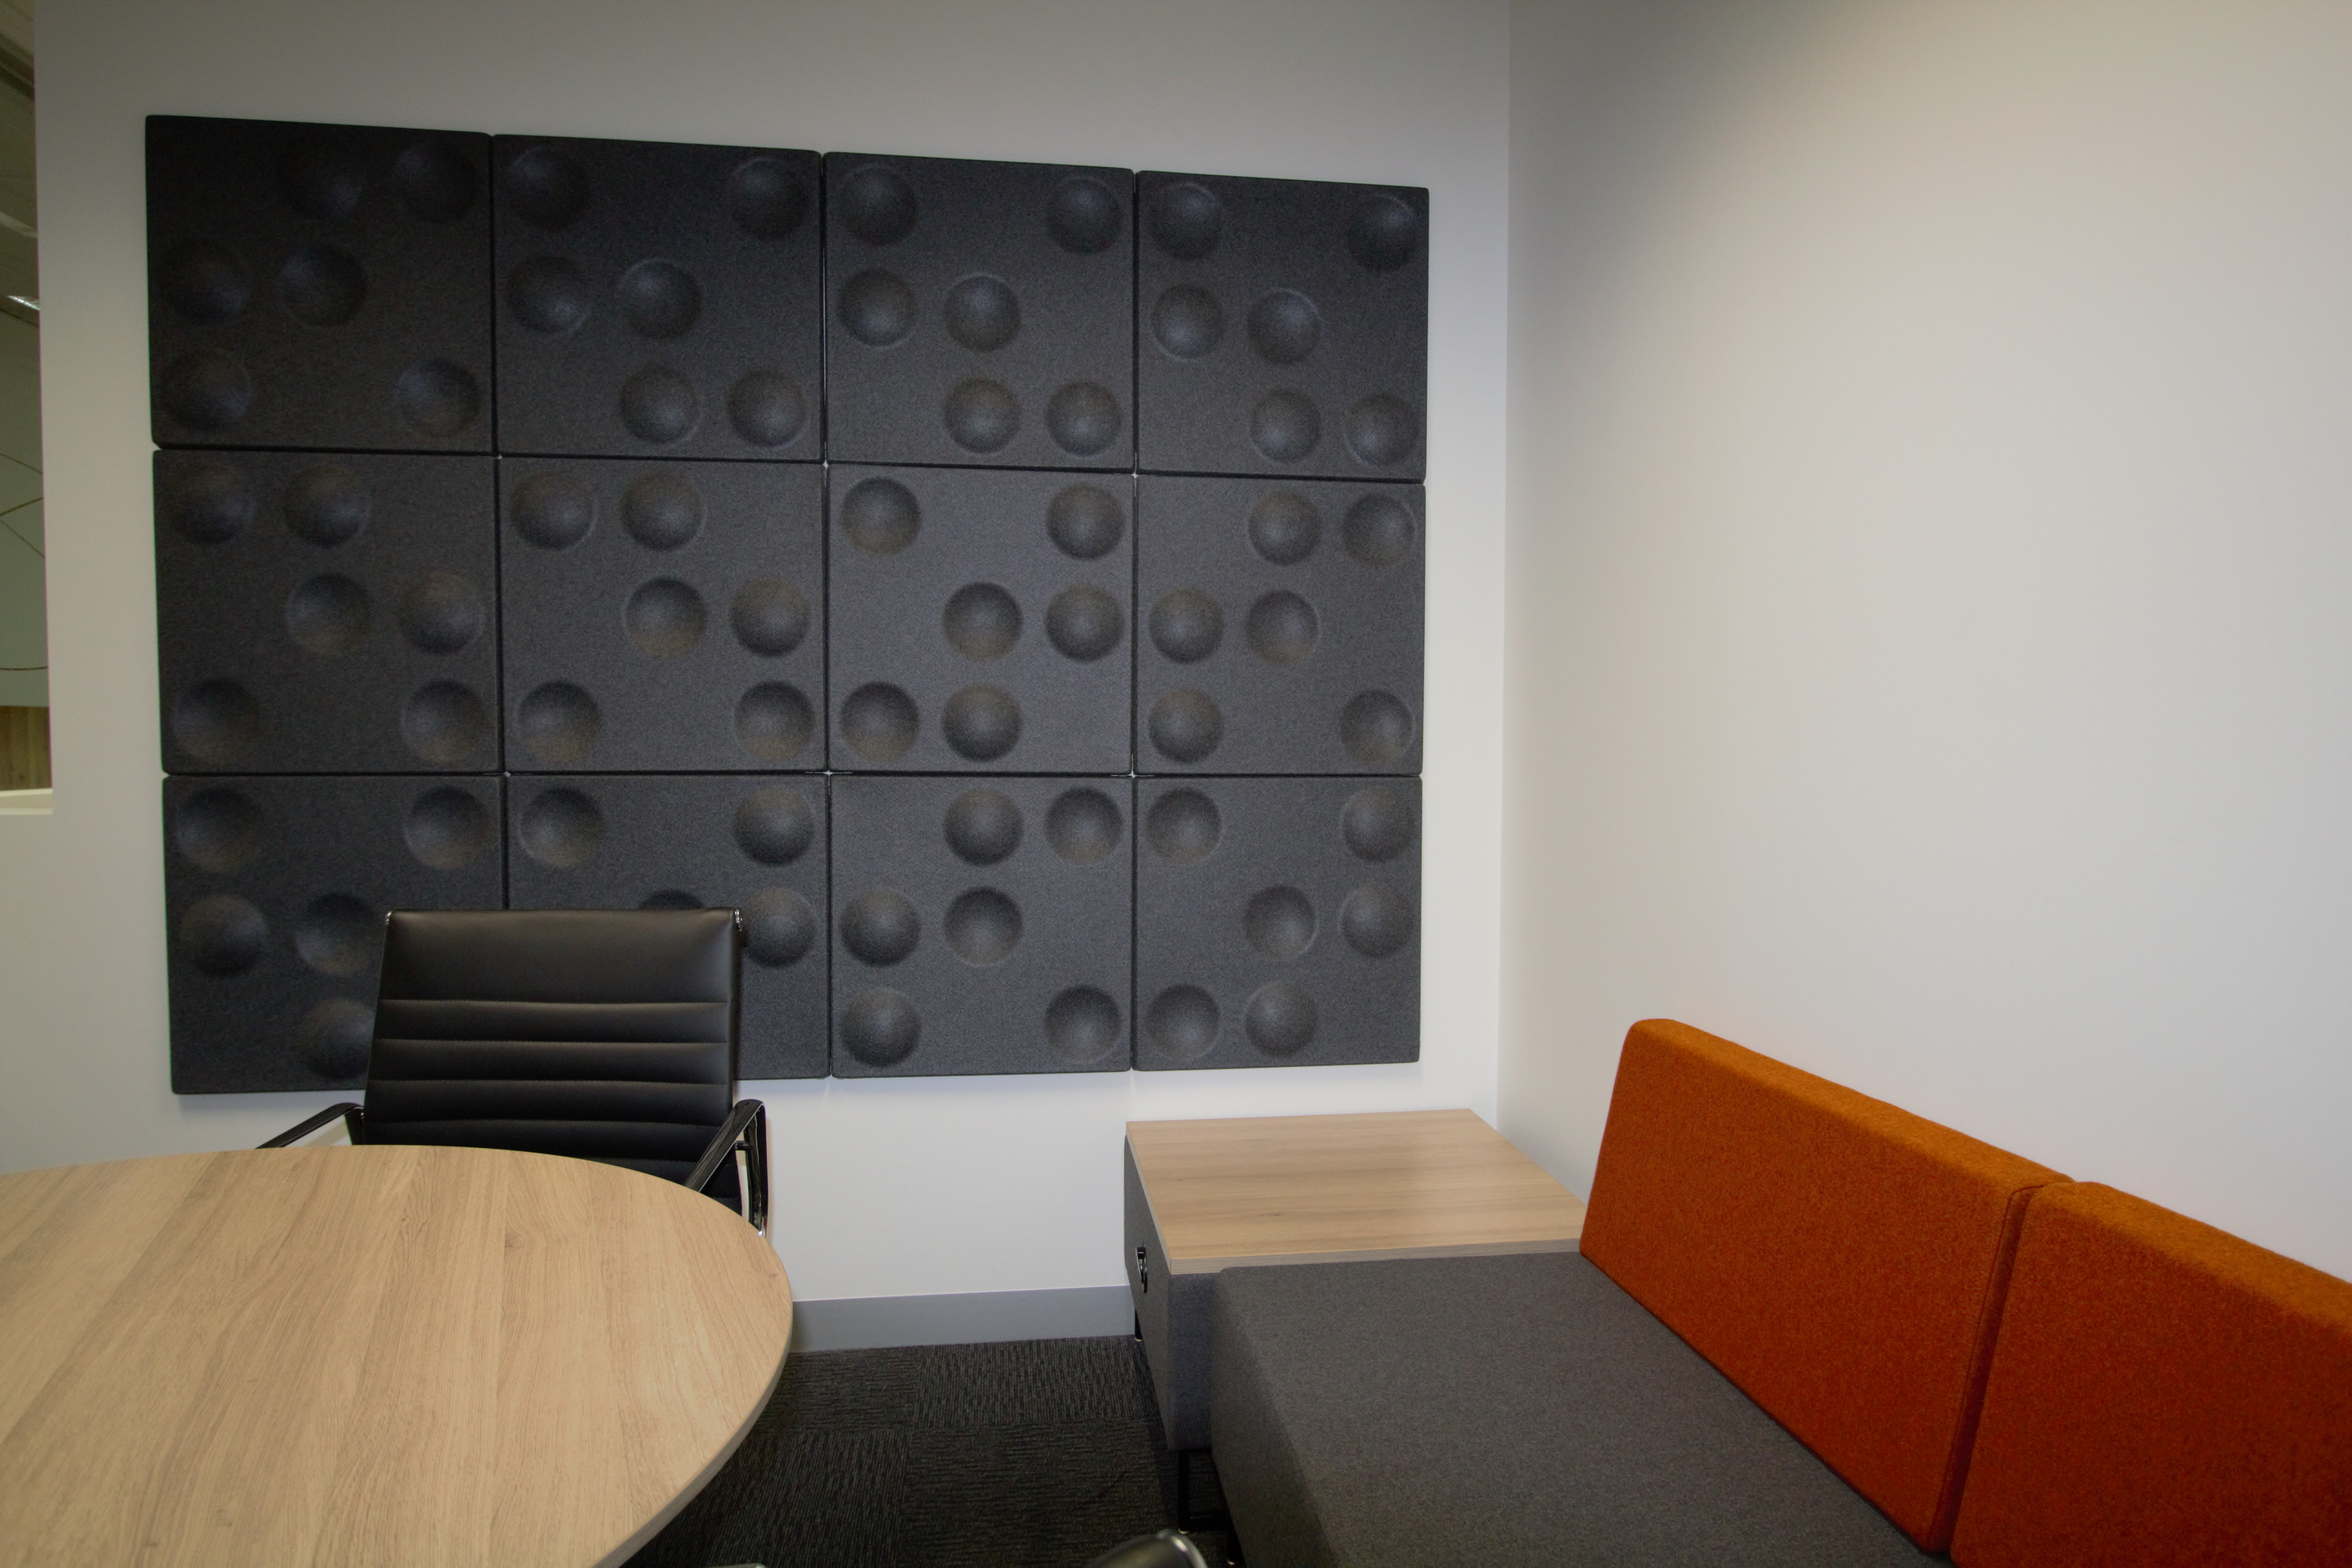 Shoretel Meeting Room: Series 5 - 34 Acoustic 3D Wall Tile